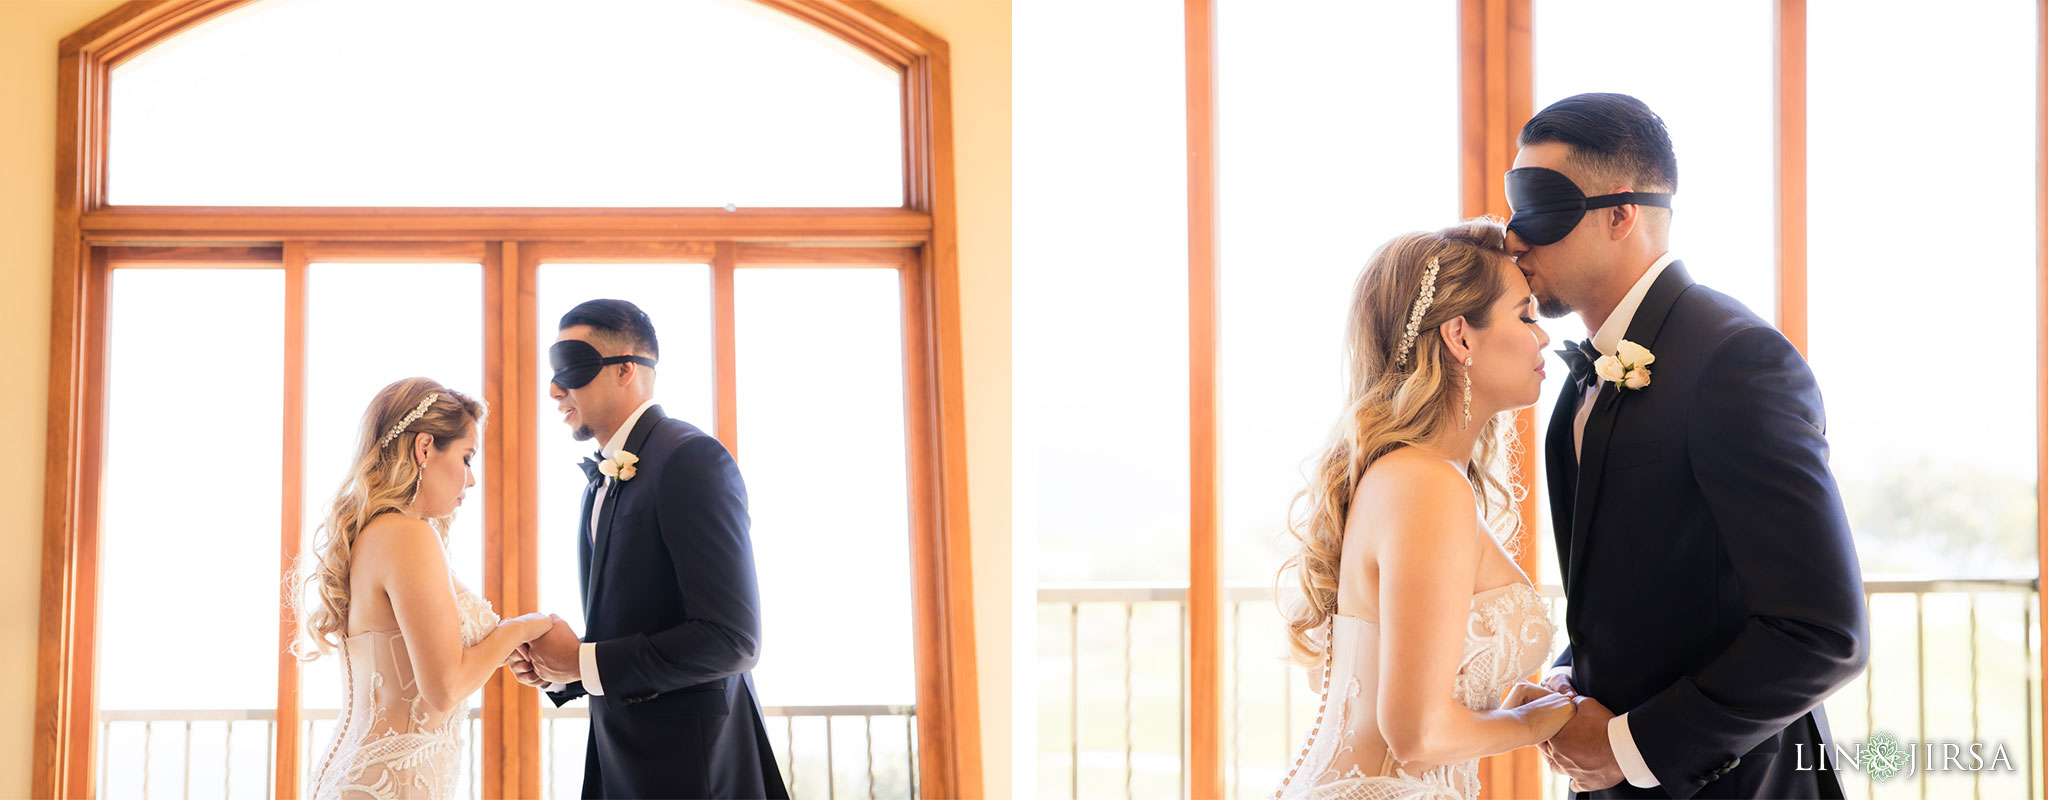 10 trump national golf club palos verdes first touch wedding photography